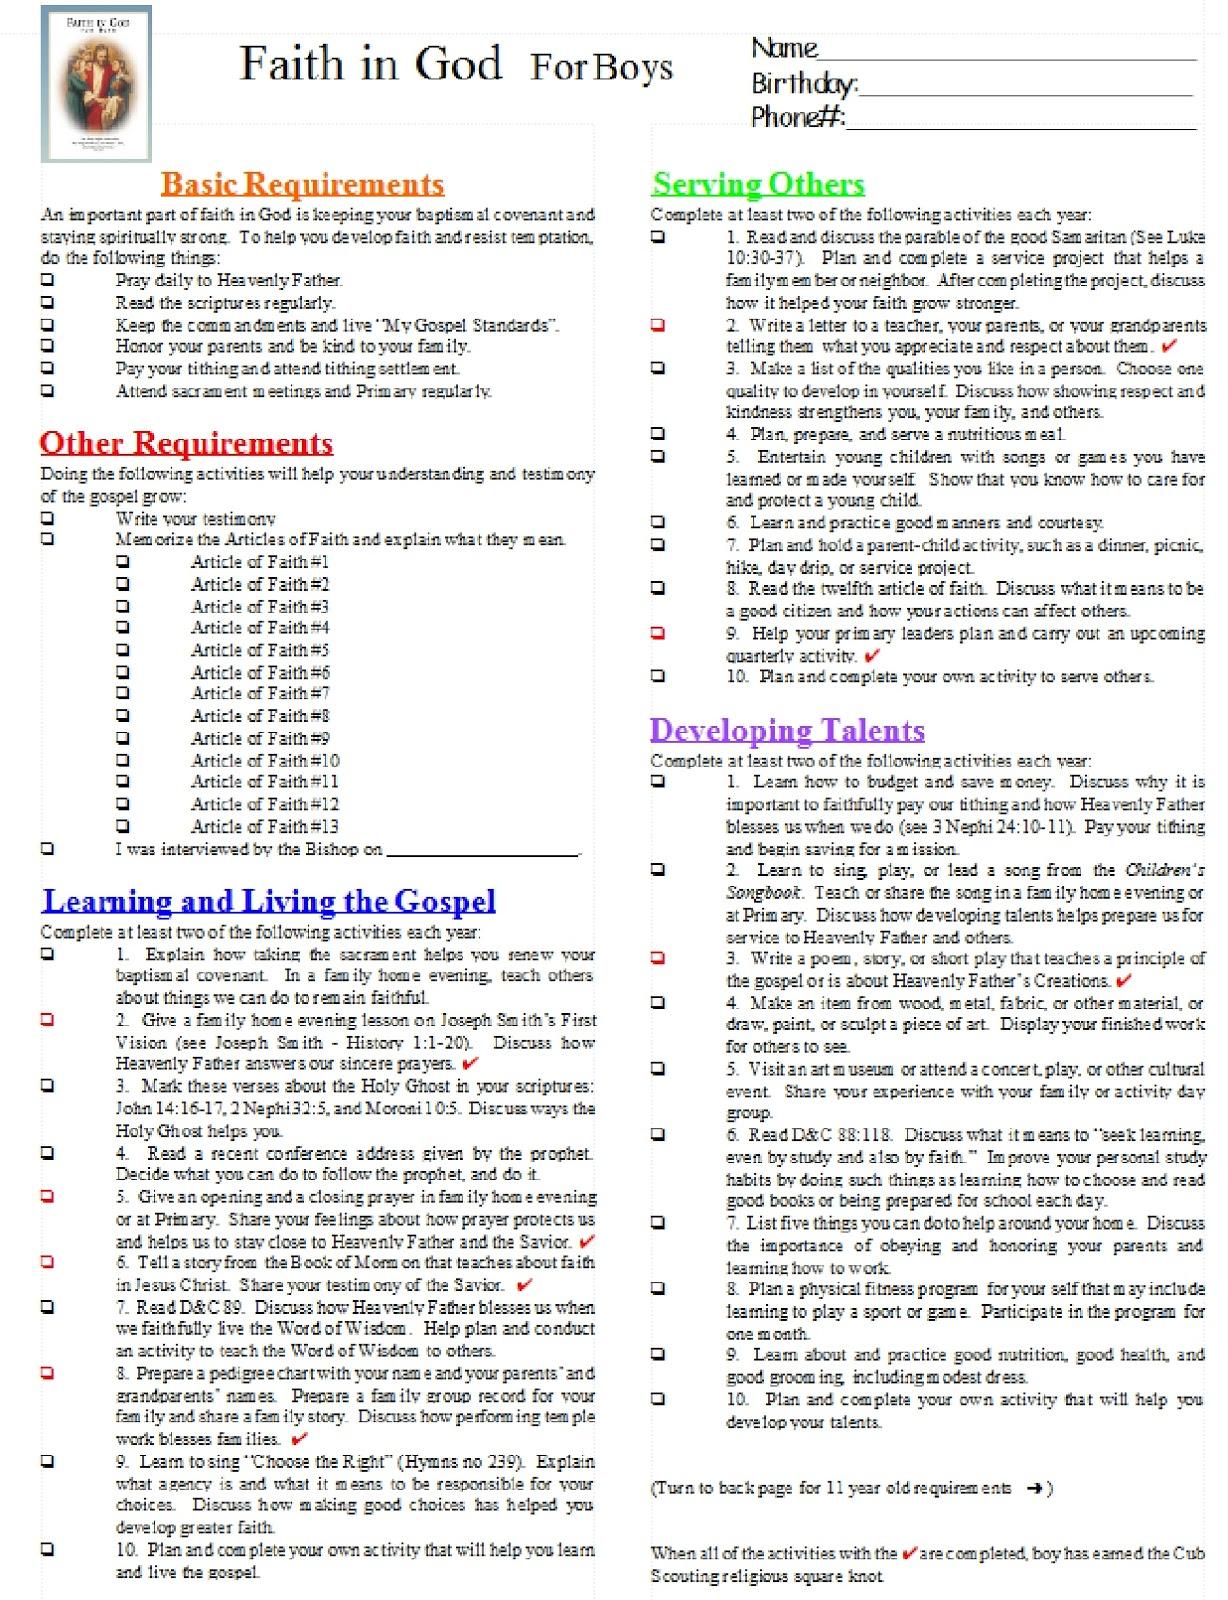 Bobcat Requirements Worksheet